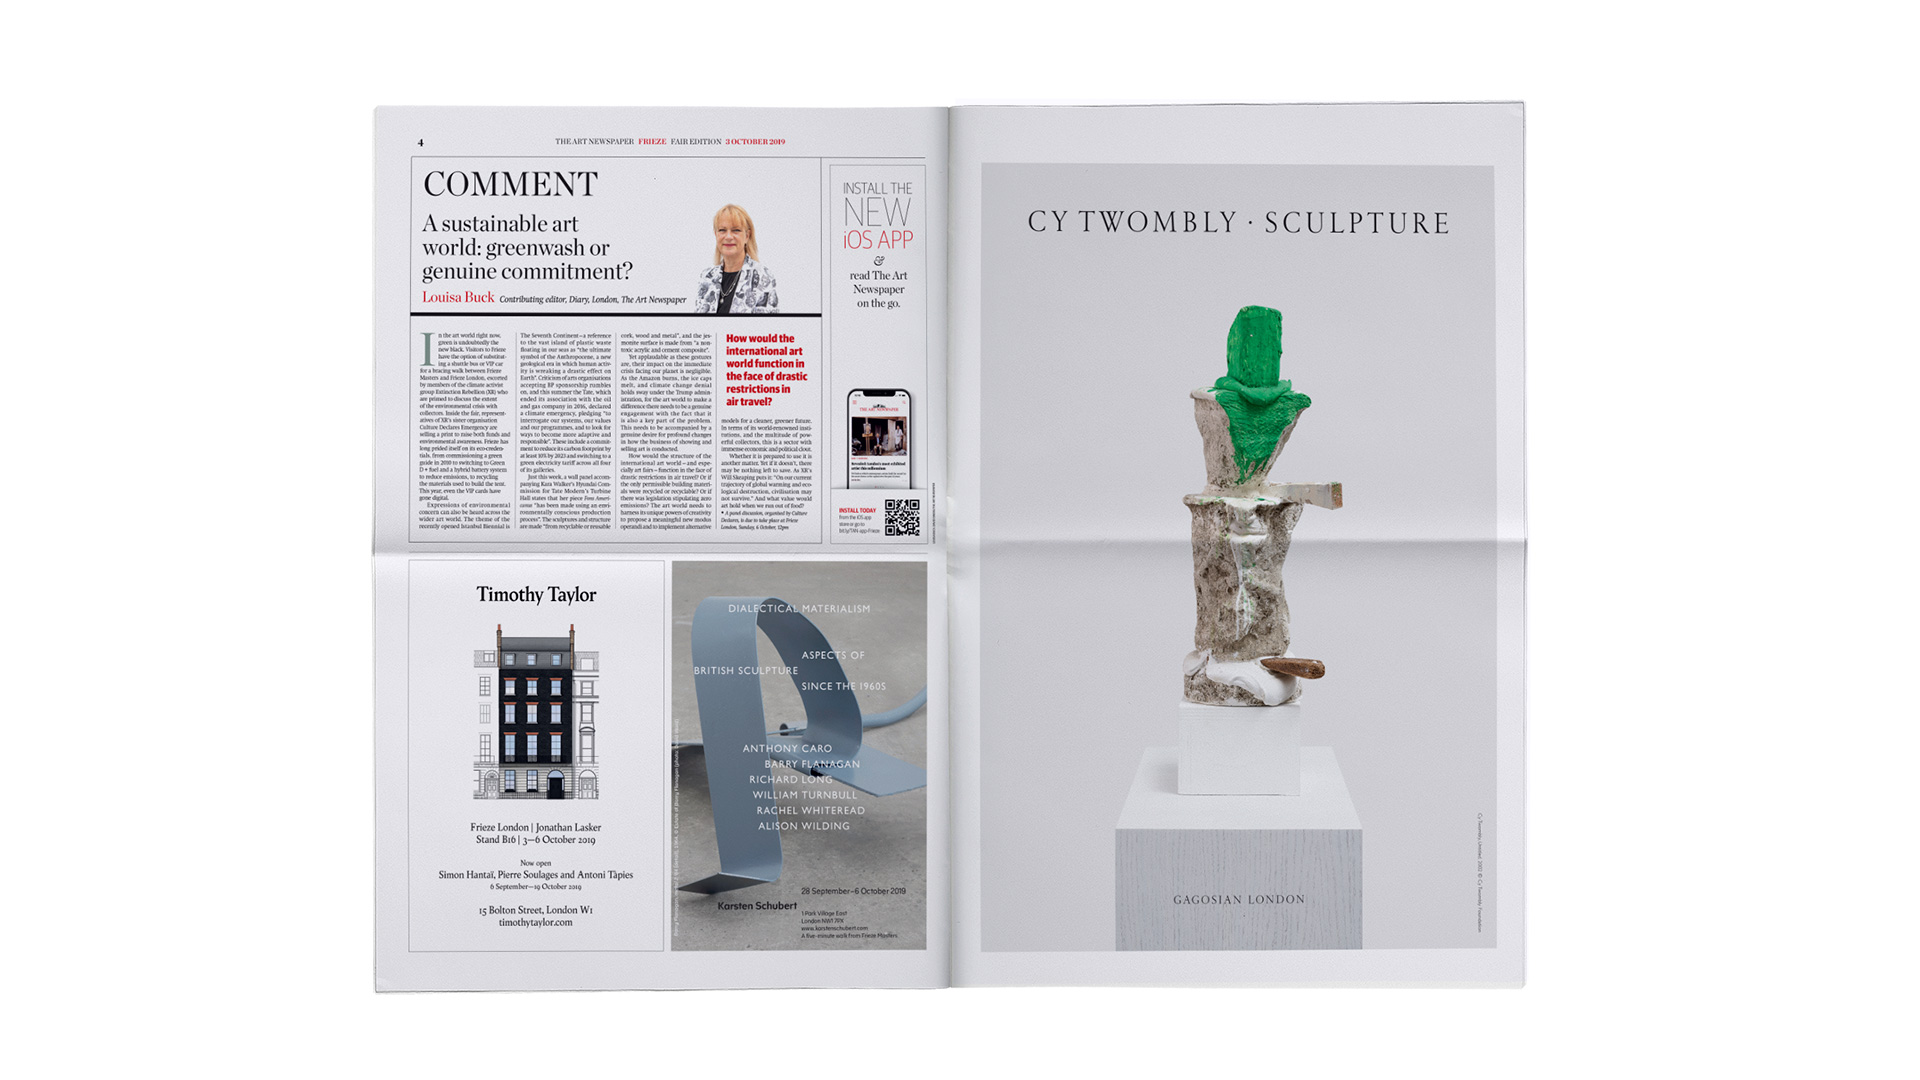 TAN-Newspaper-Frieze-LON-2019-DPS-2